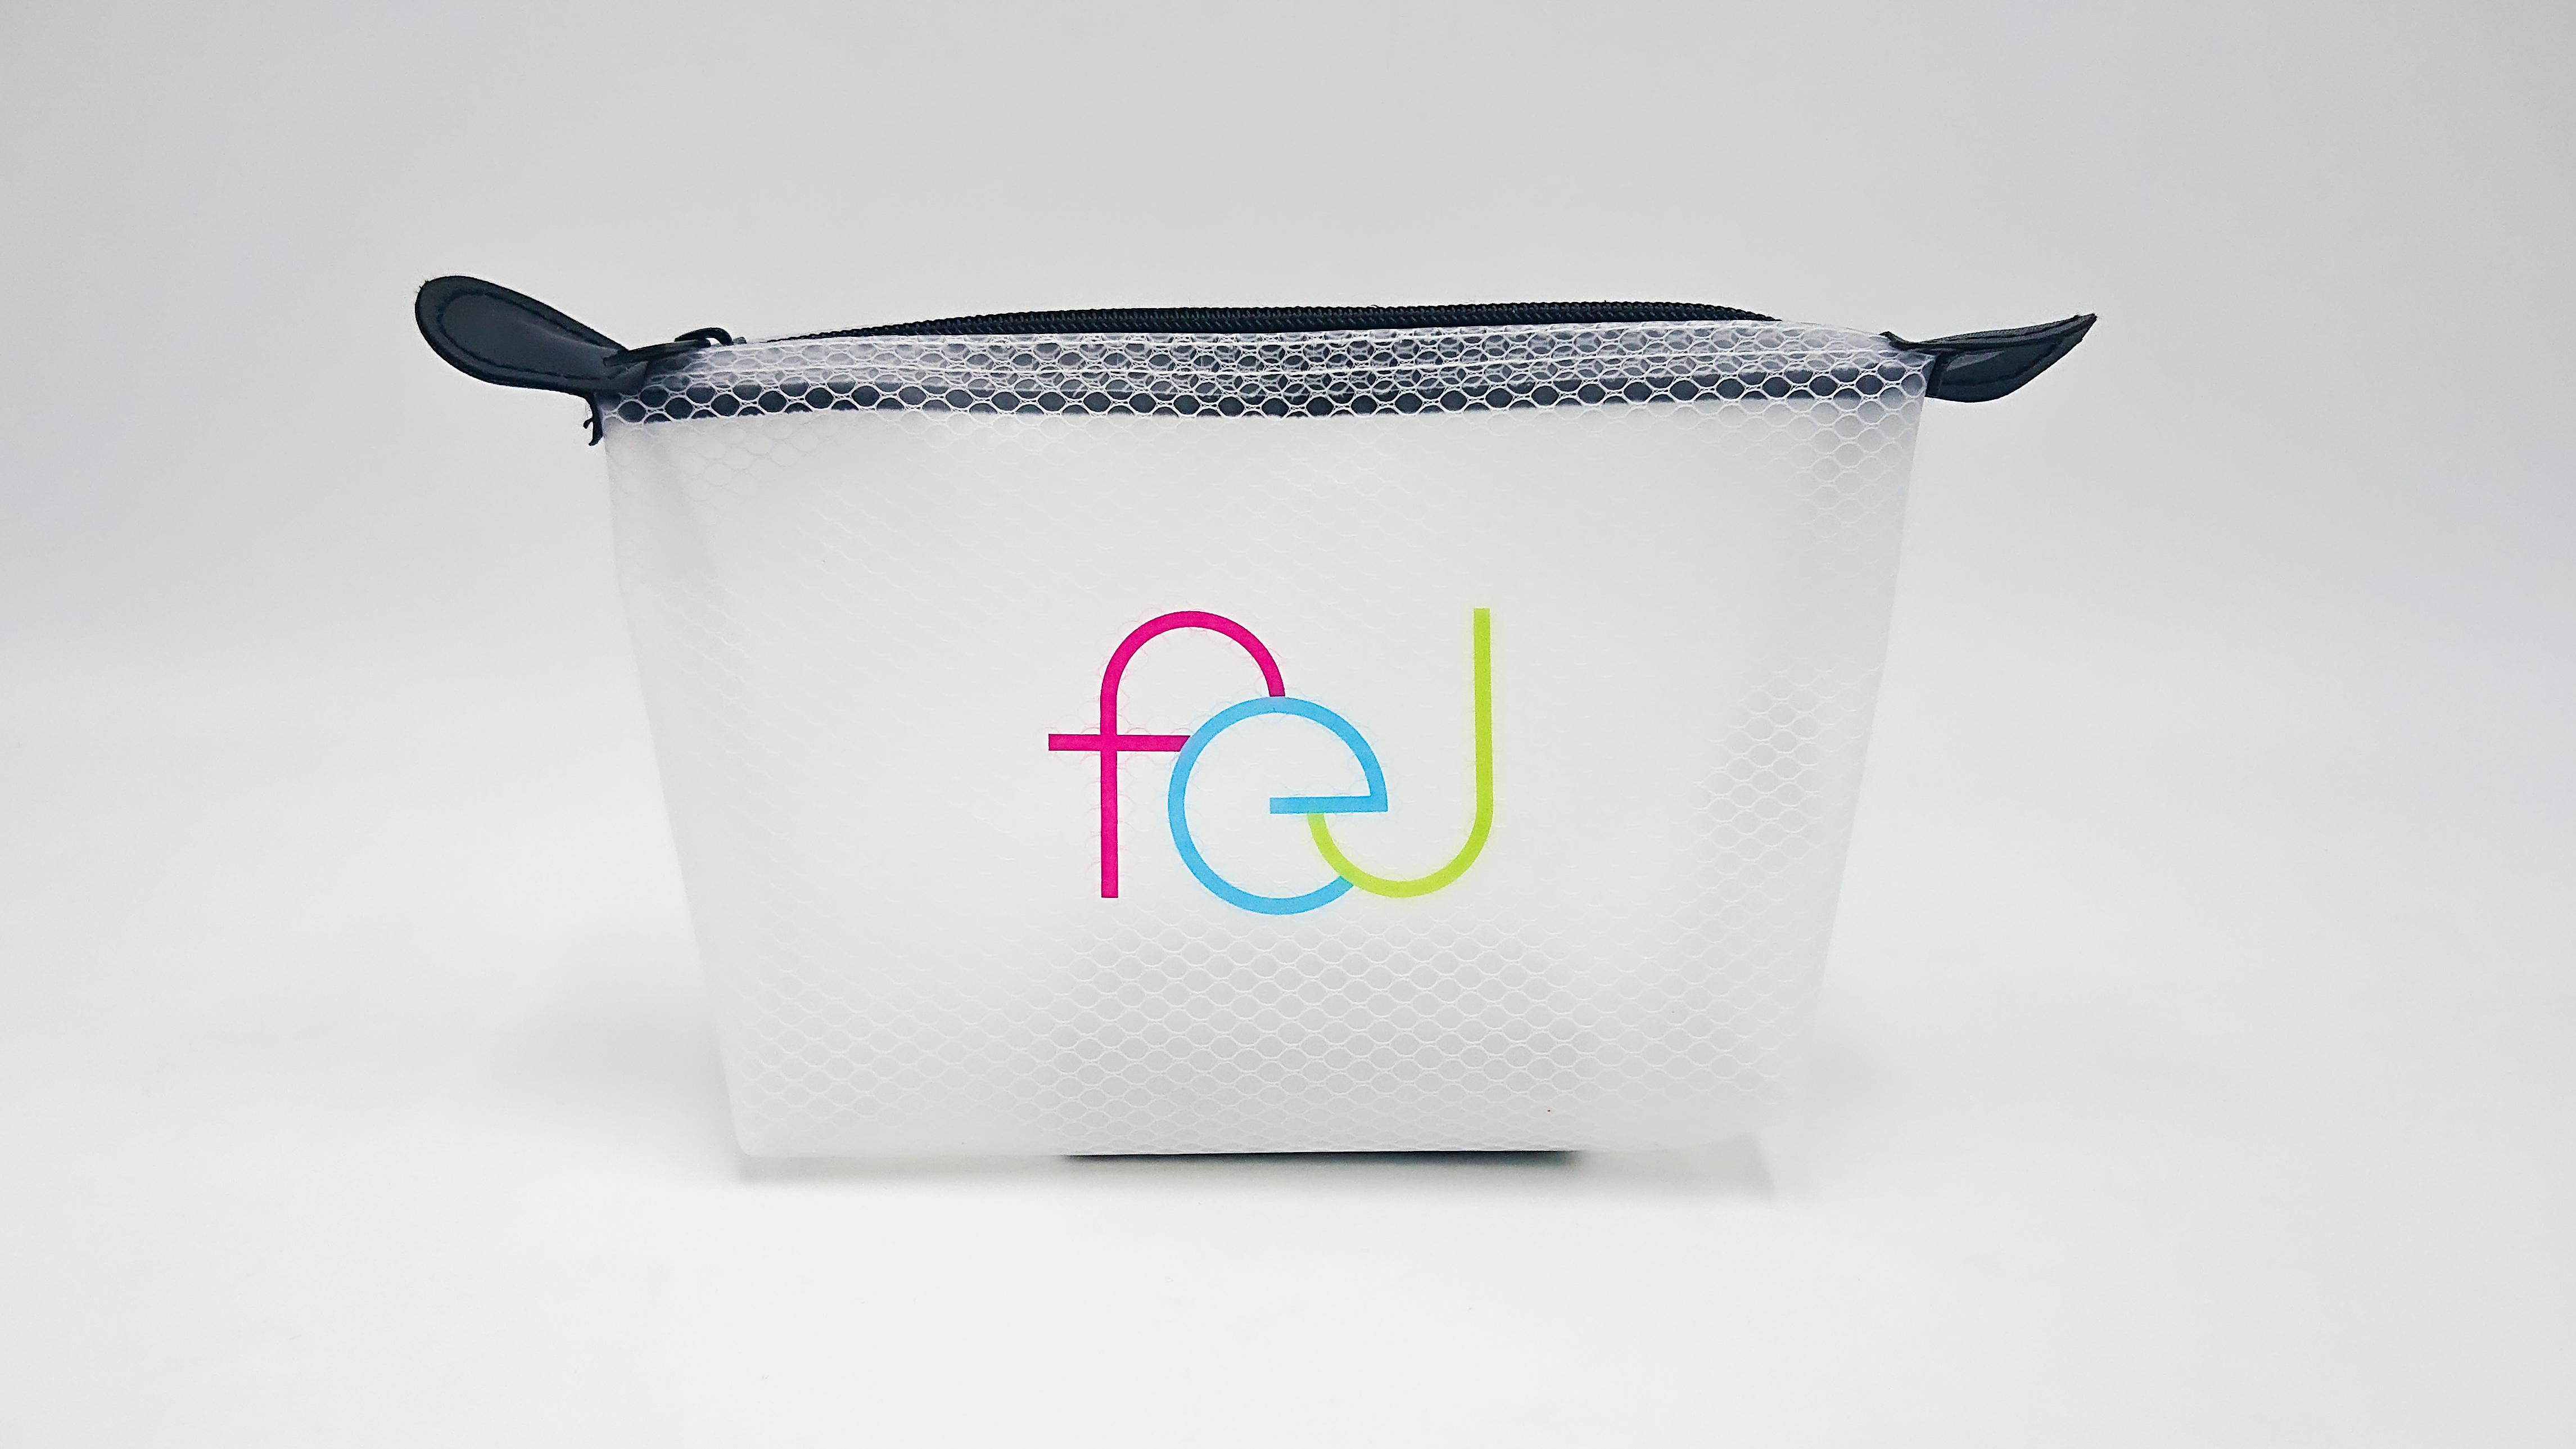 Petite housse transparente FEJ - Sacs & Emballages